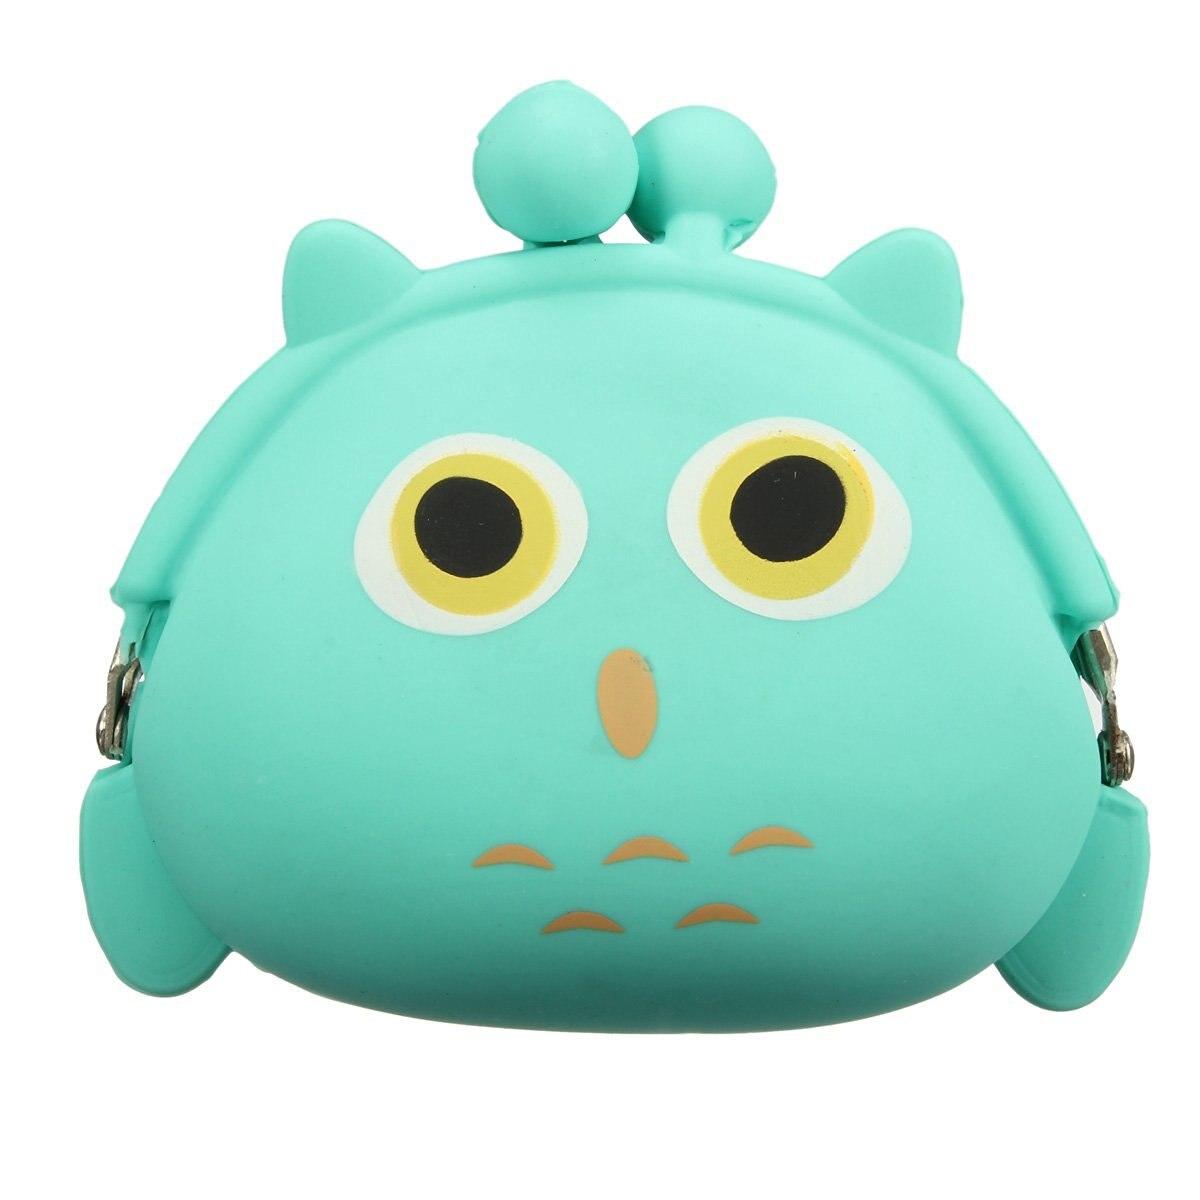 5) Women Girls Wallet Kawaii Cute Cartoon Animal Silicone Jelly Coin Bag Purse Kids Gift Owl